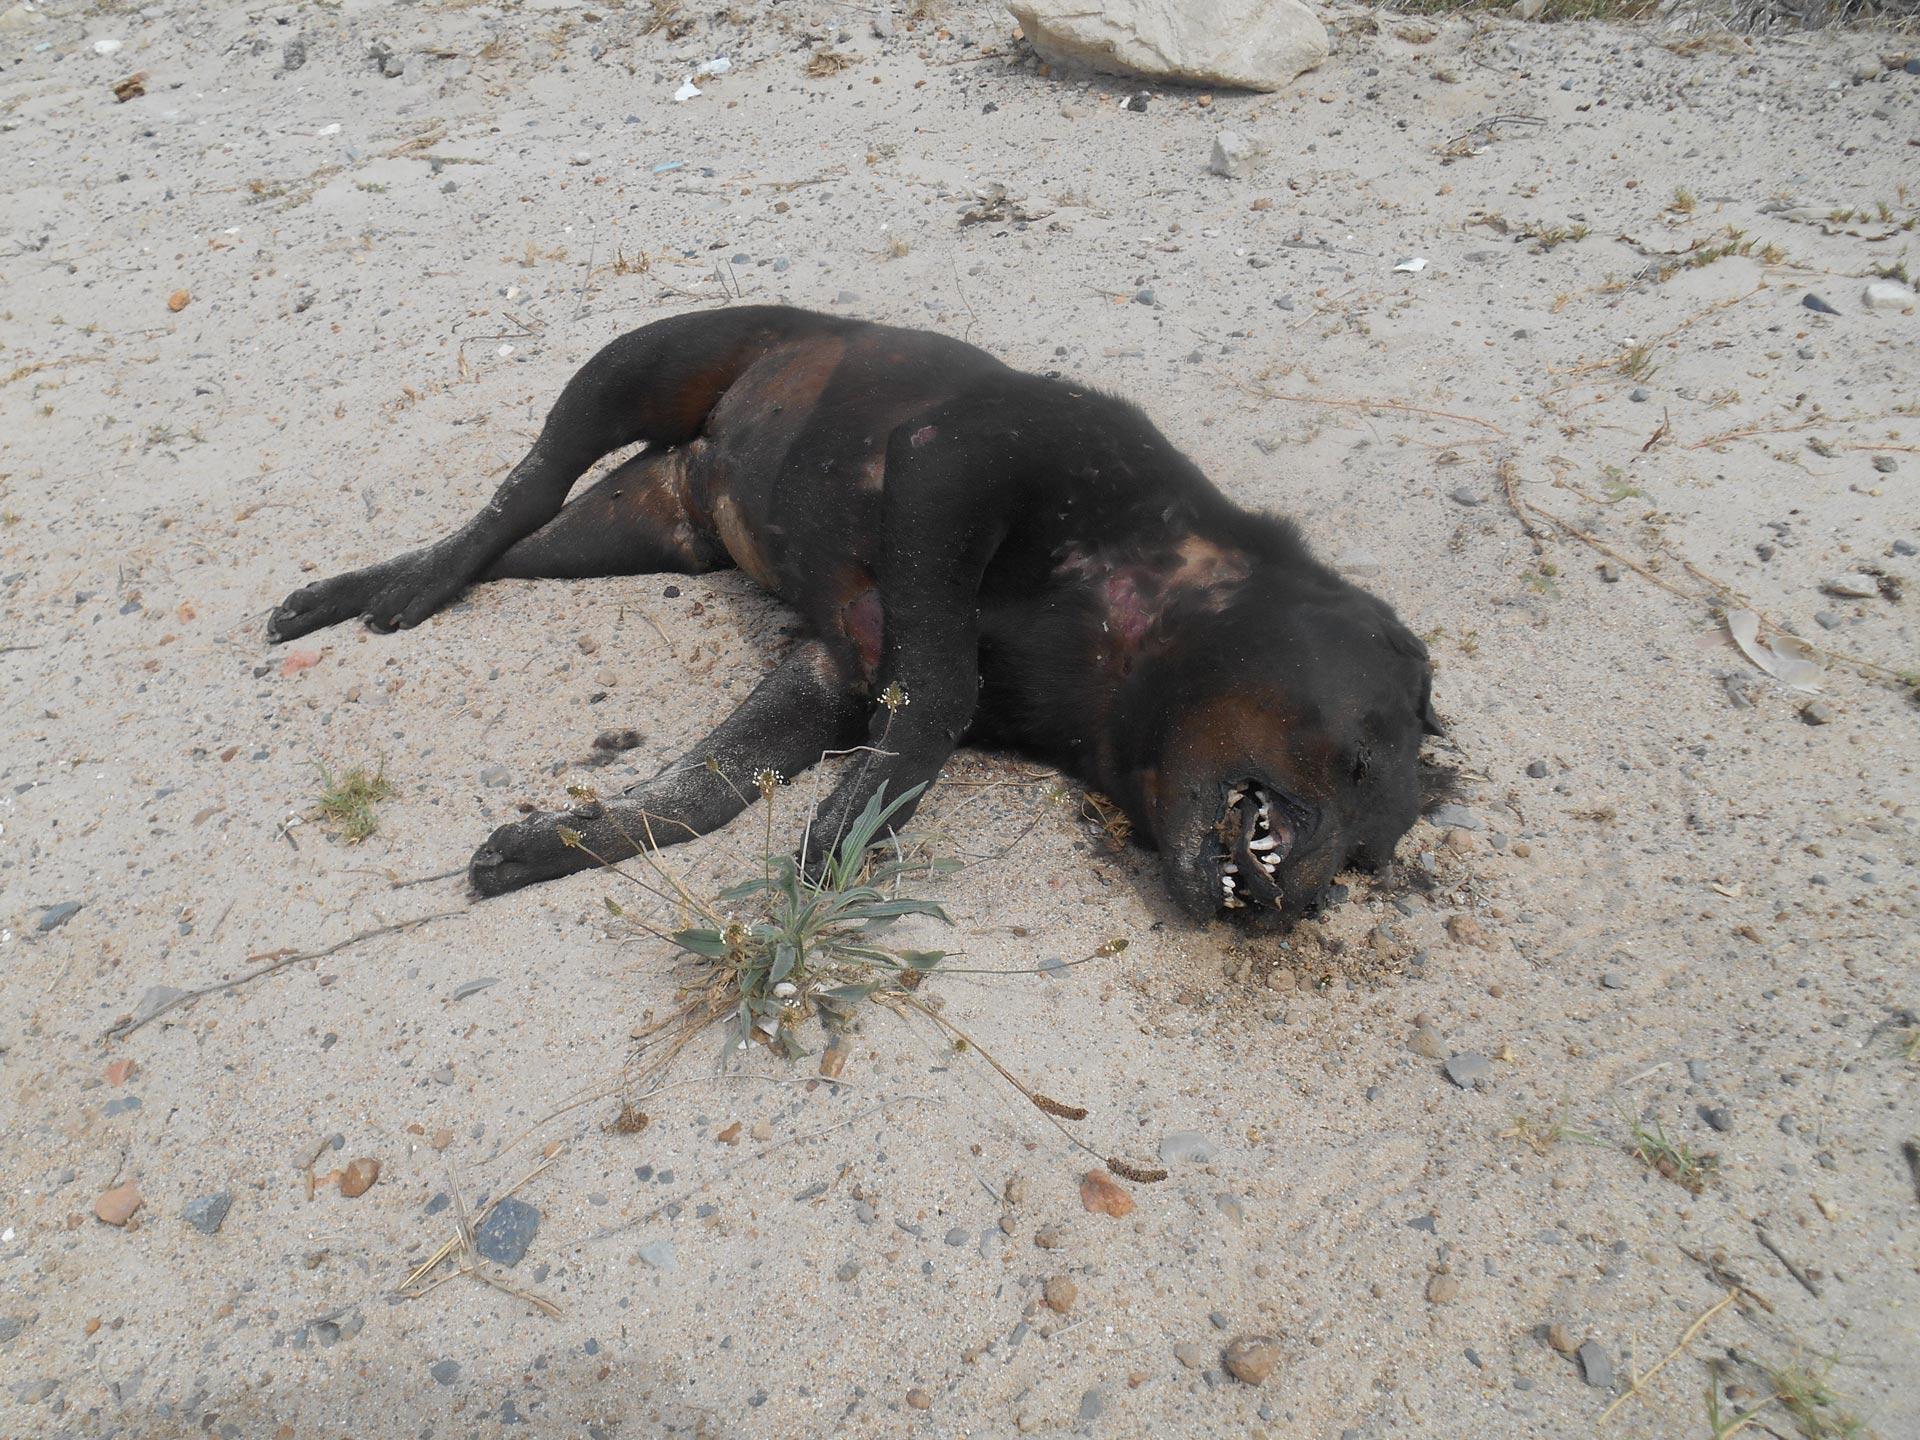 Hund schwarz - Südafrika